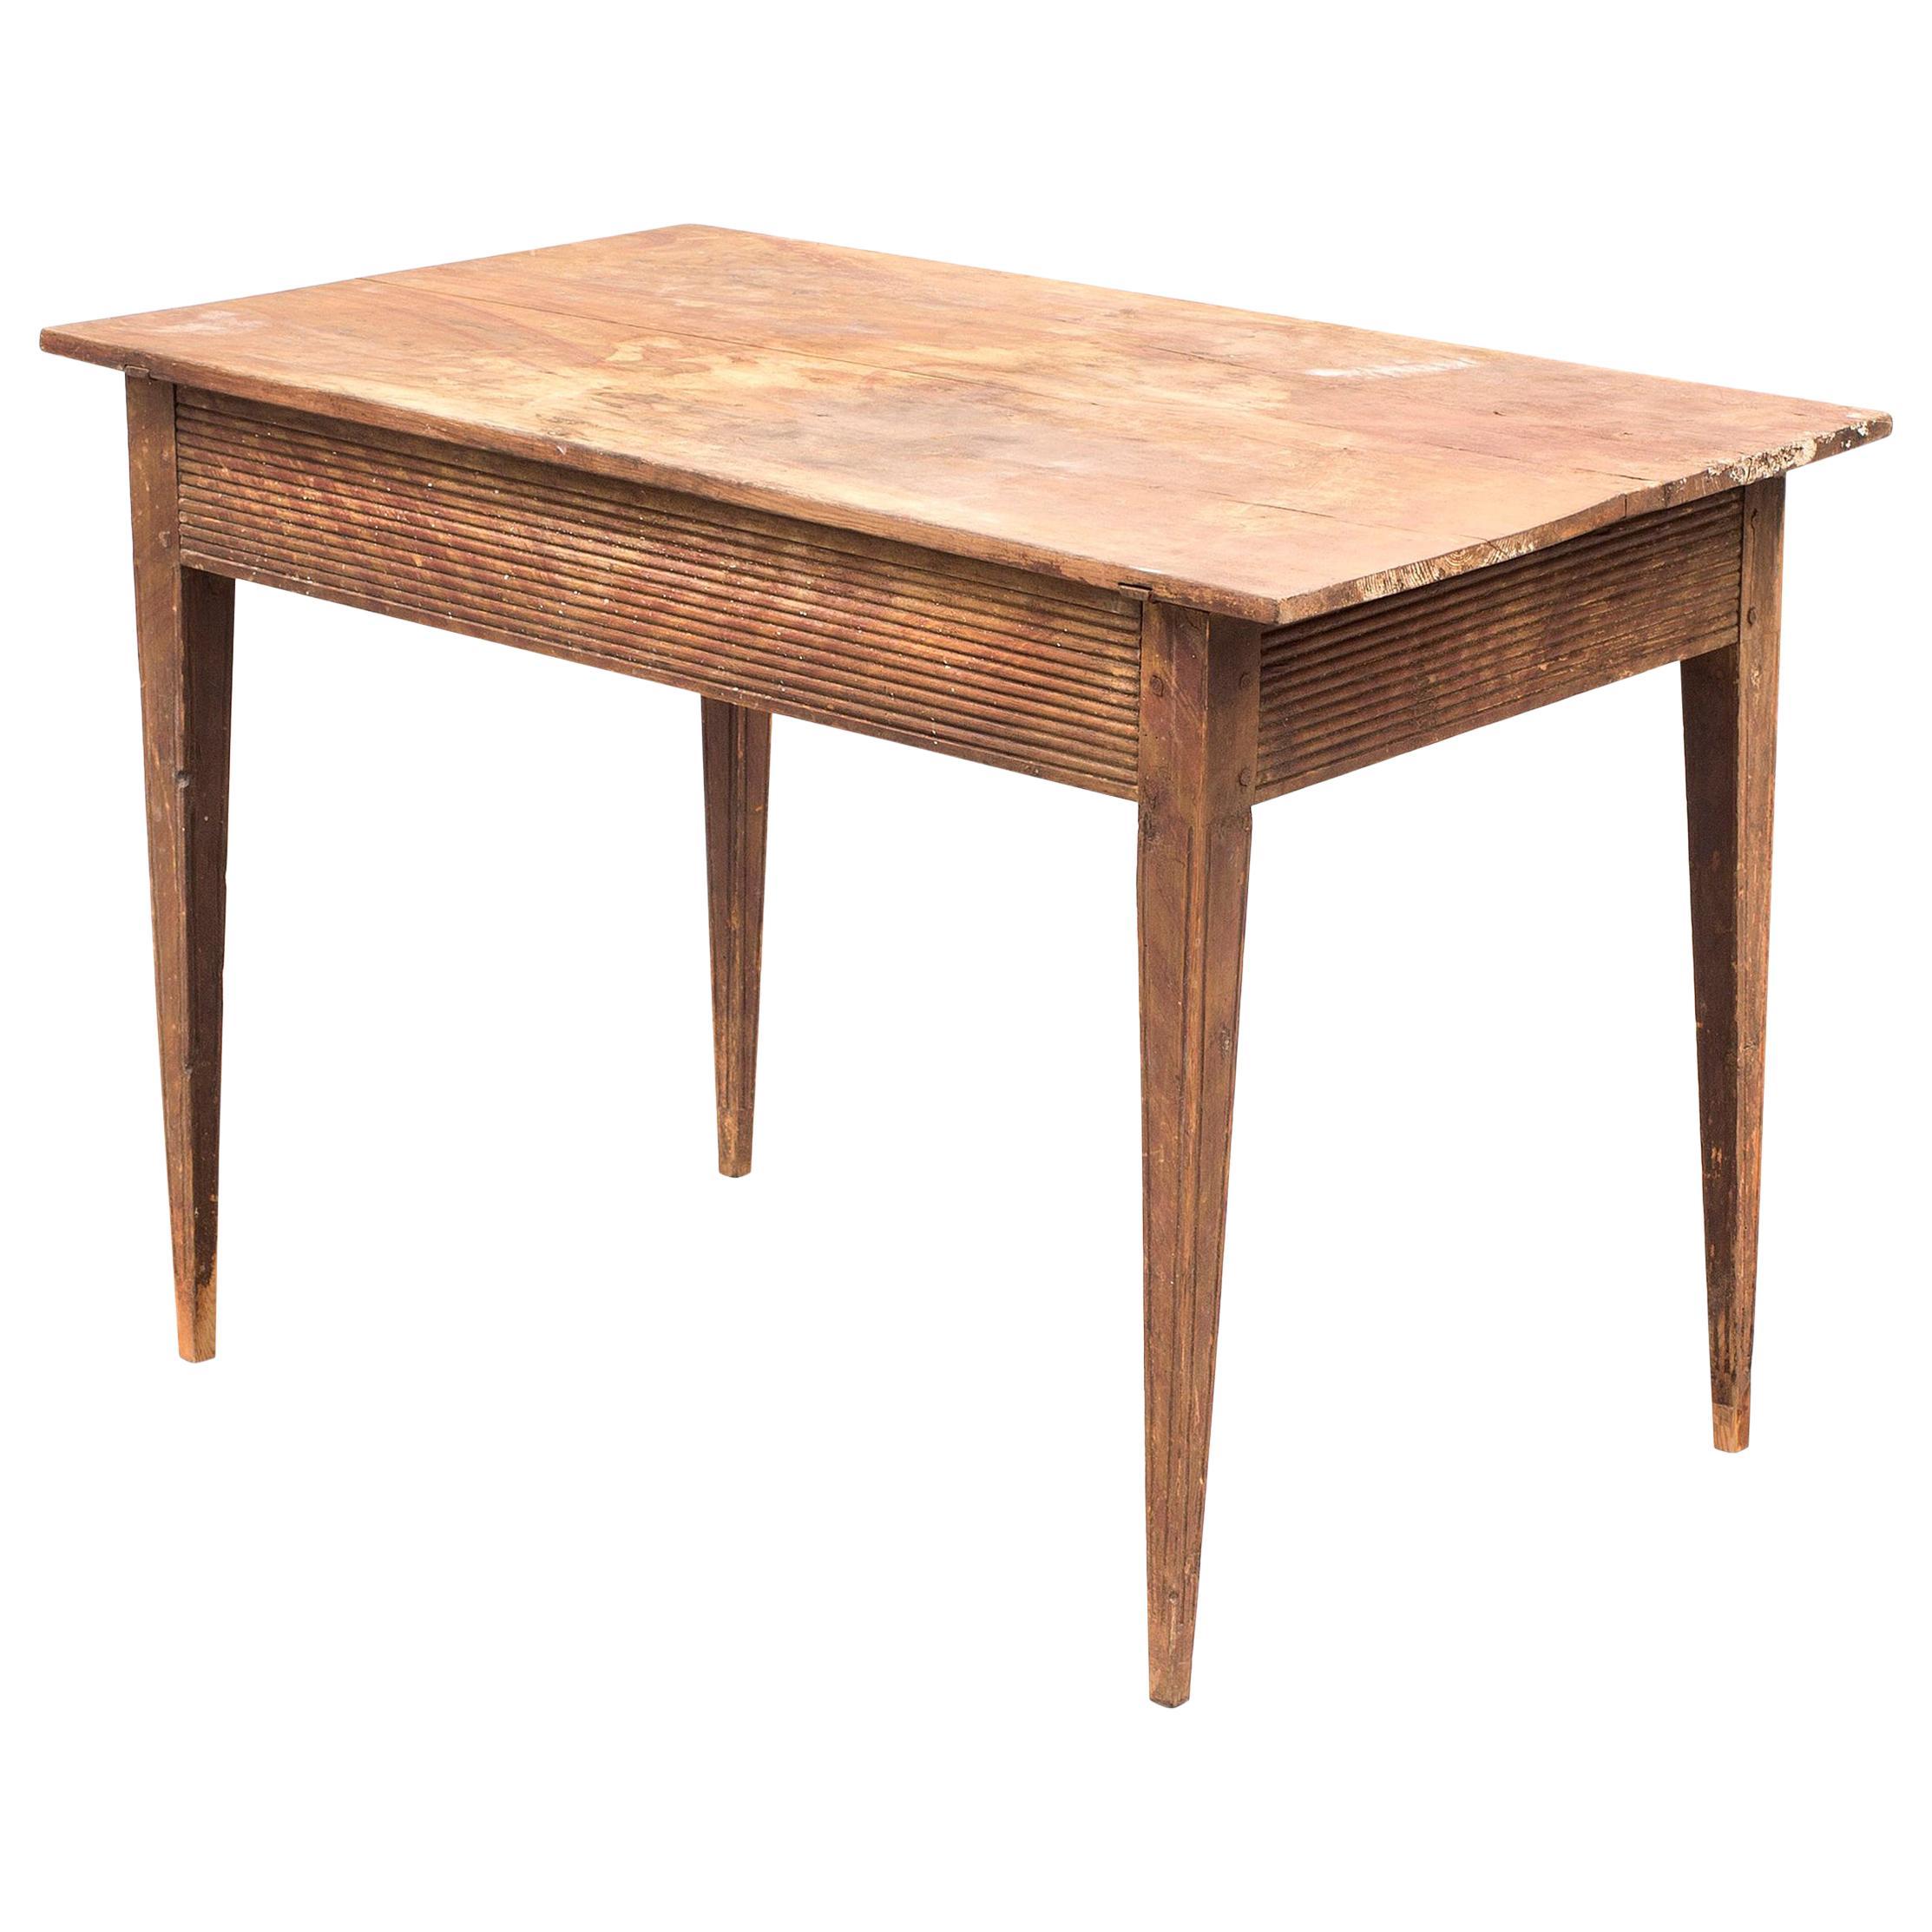 Swedish Folk Art Side Table, 18th Century